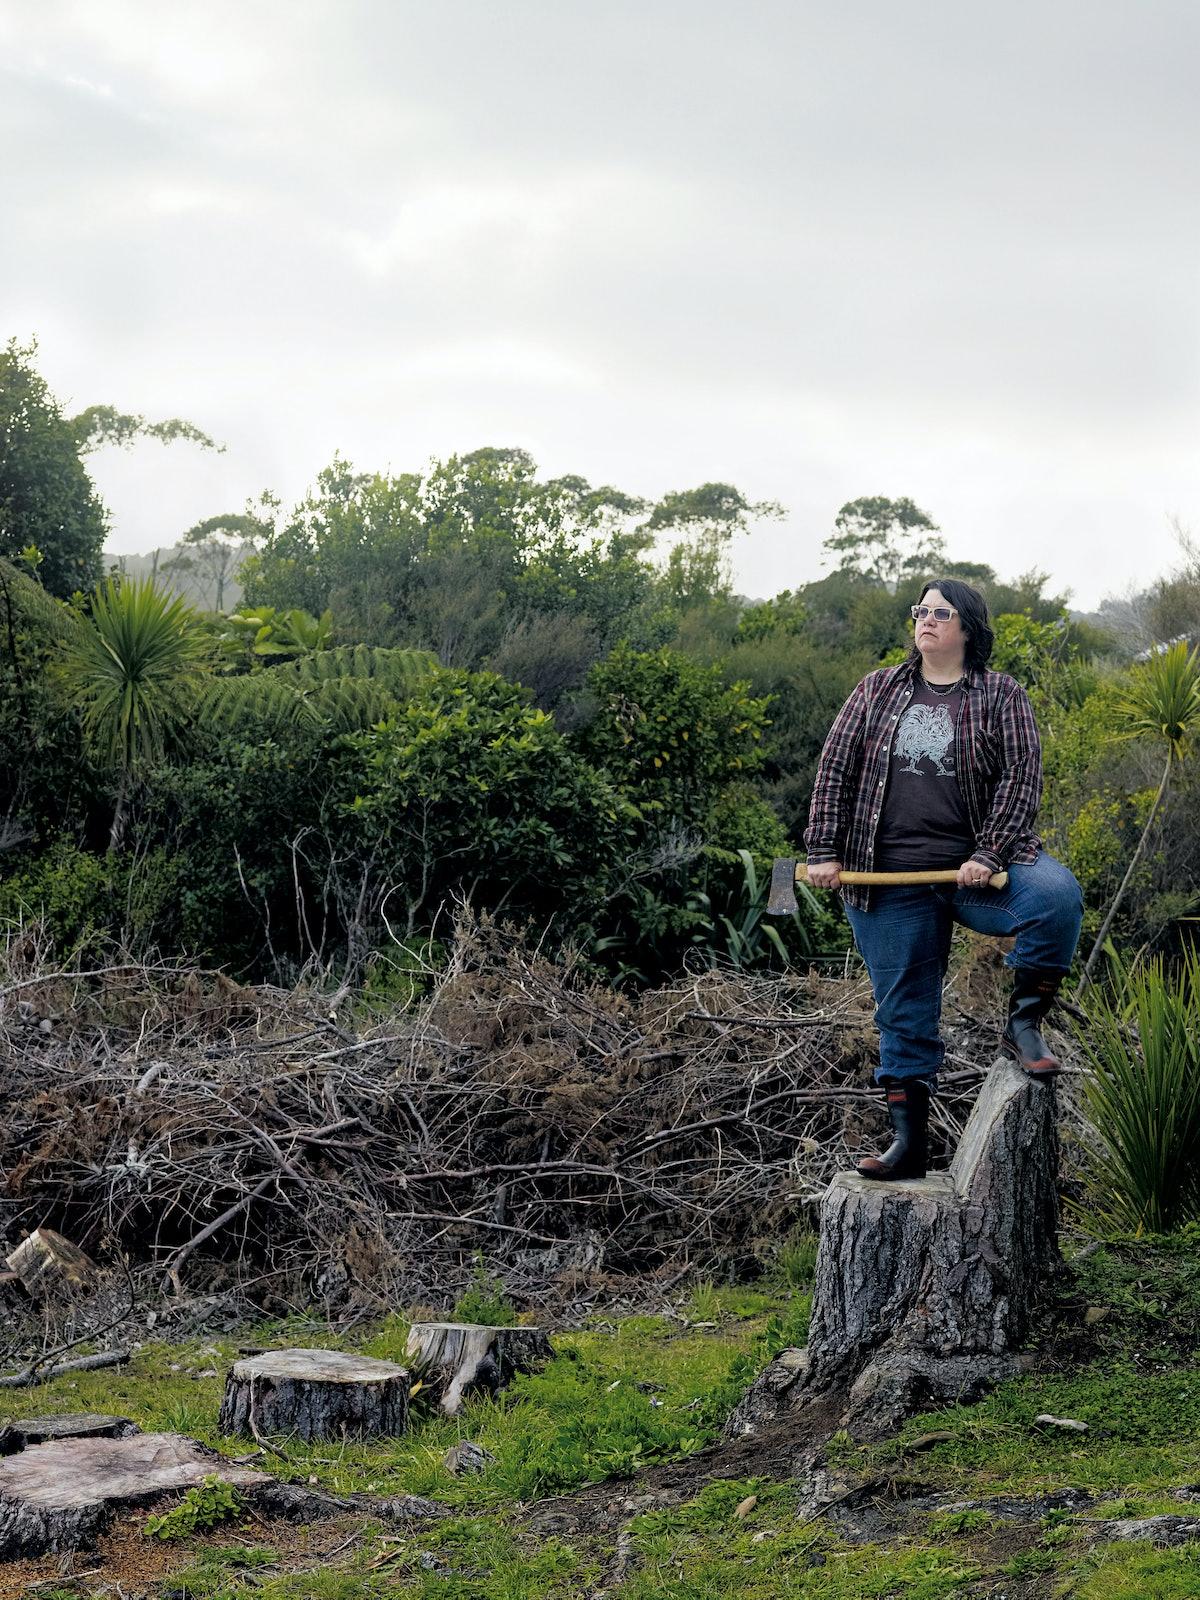 Self-Portrait/Chopping, 2011